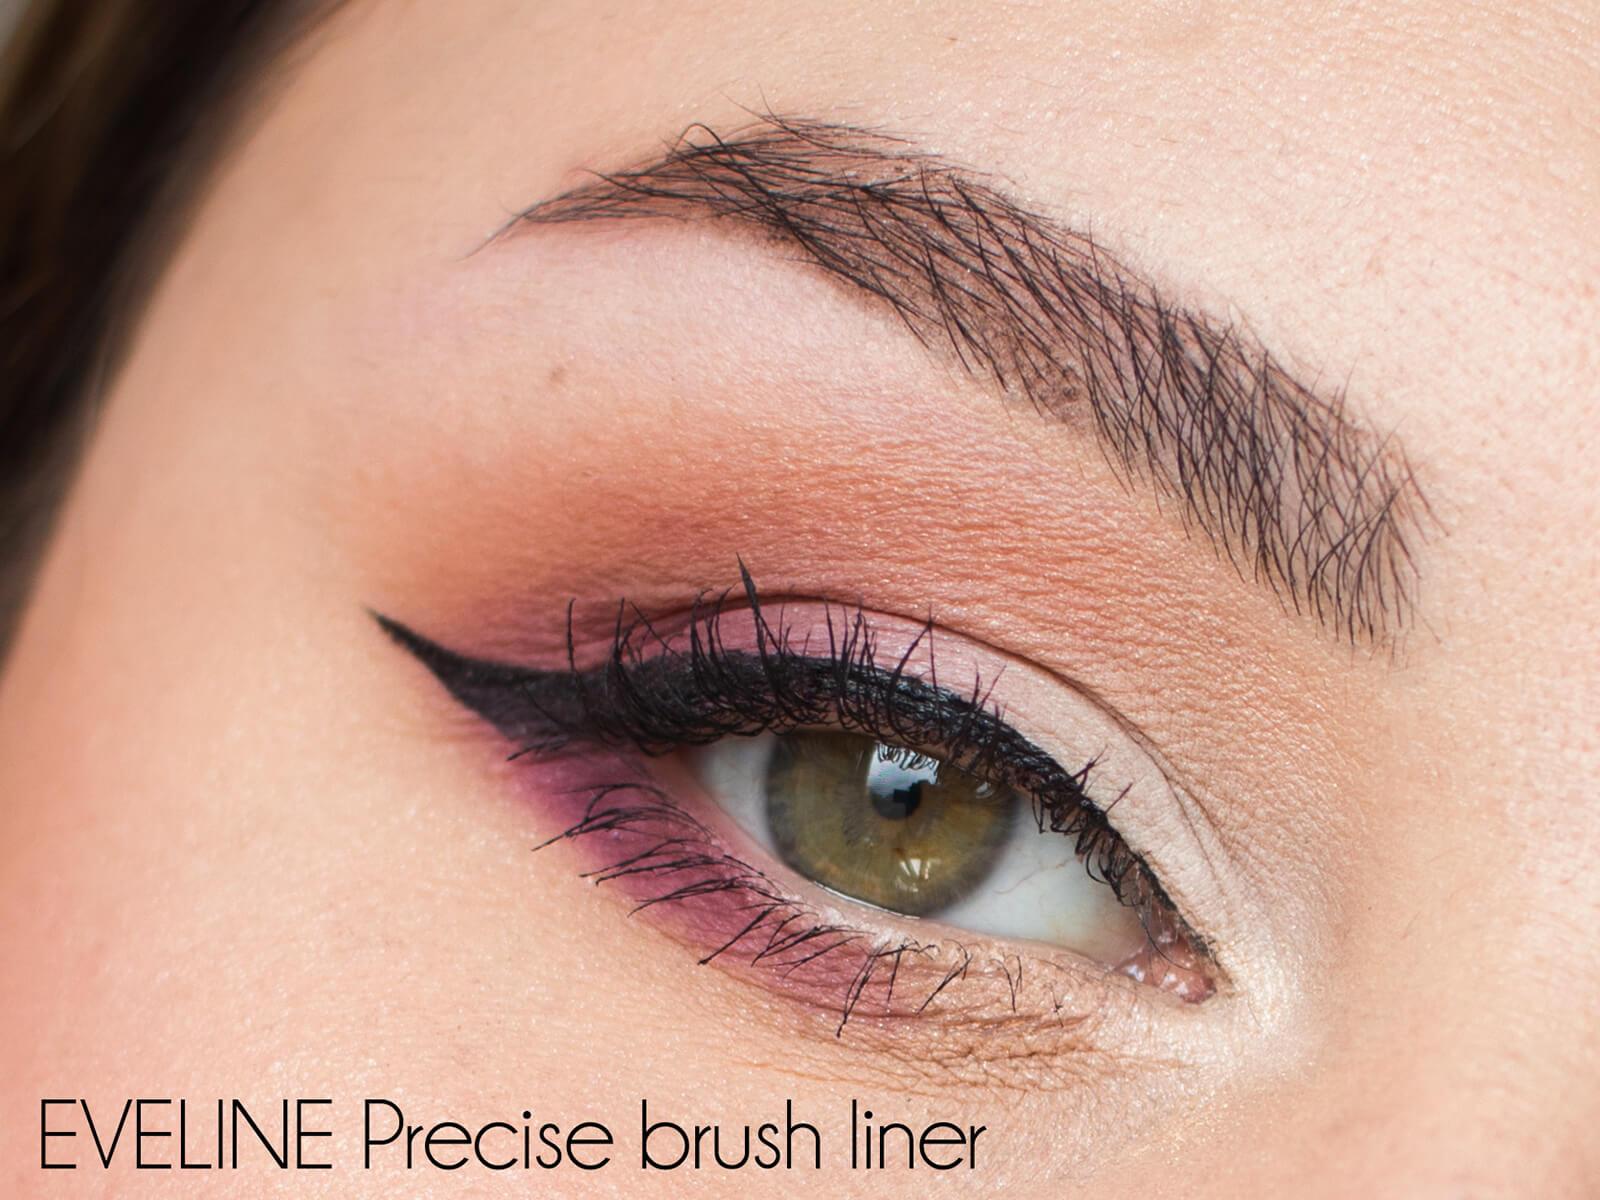 eveline precise brush liner hebe